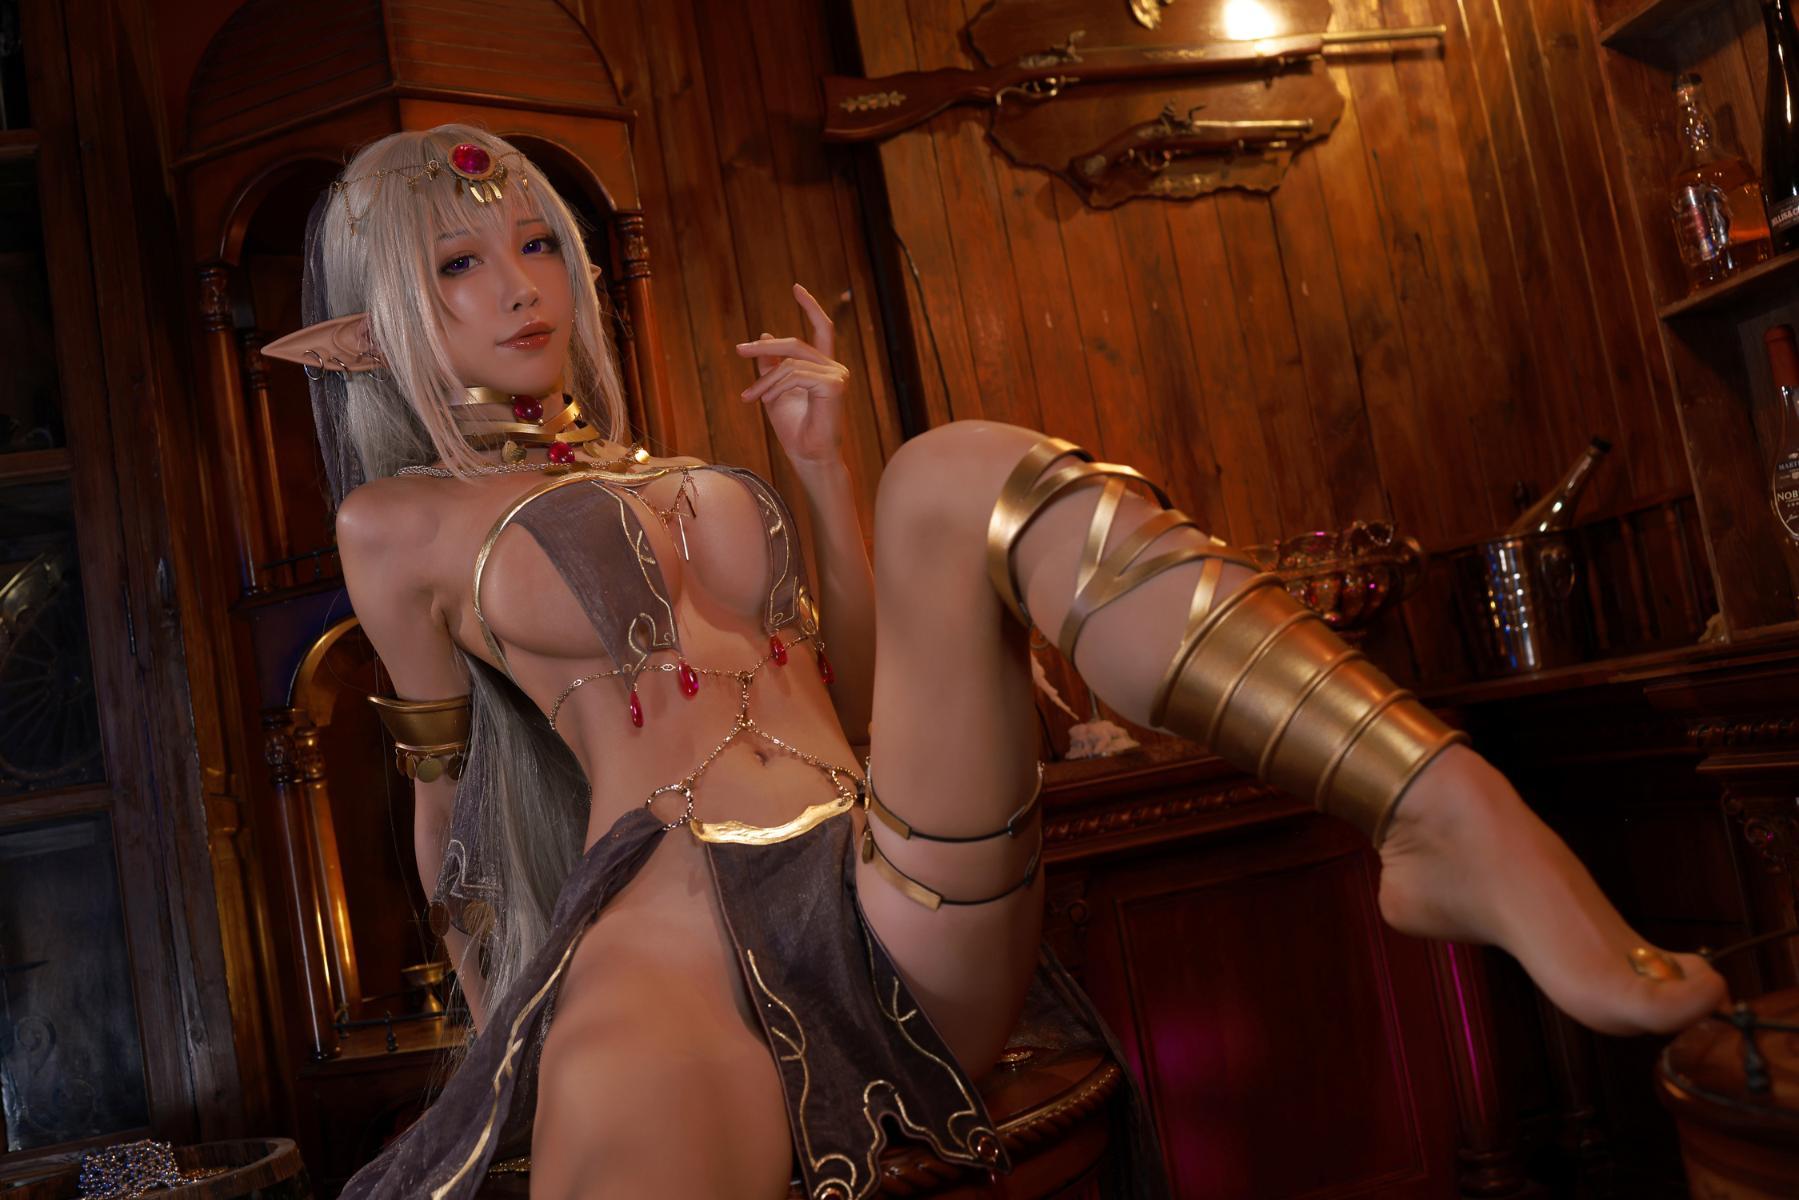 Tan Dancer Elf Succubus Cosplay by Aqua 14